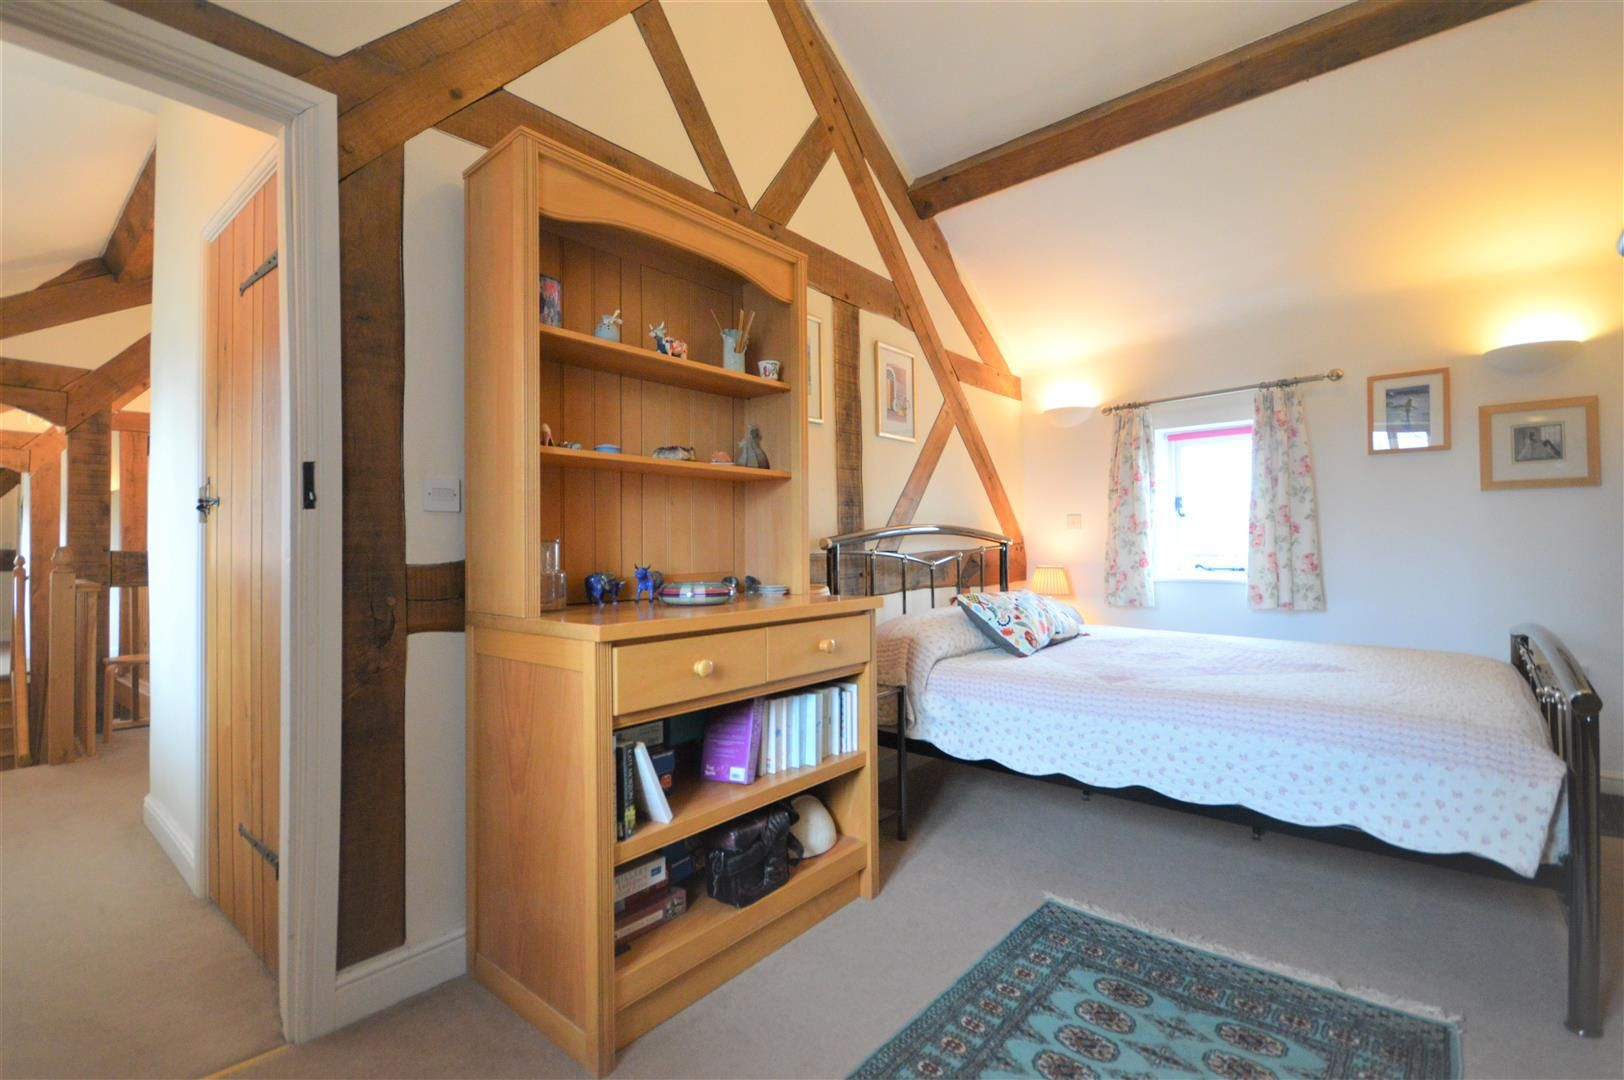 4 bed barn conversion for sale in Kingsland  - Property Image 10